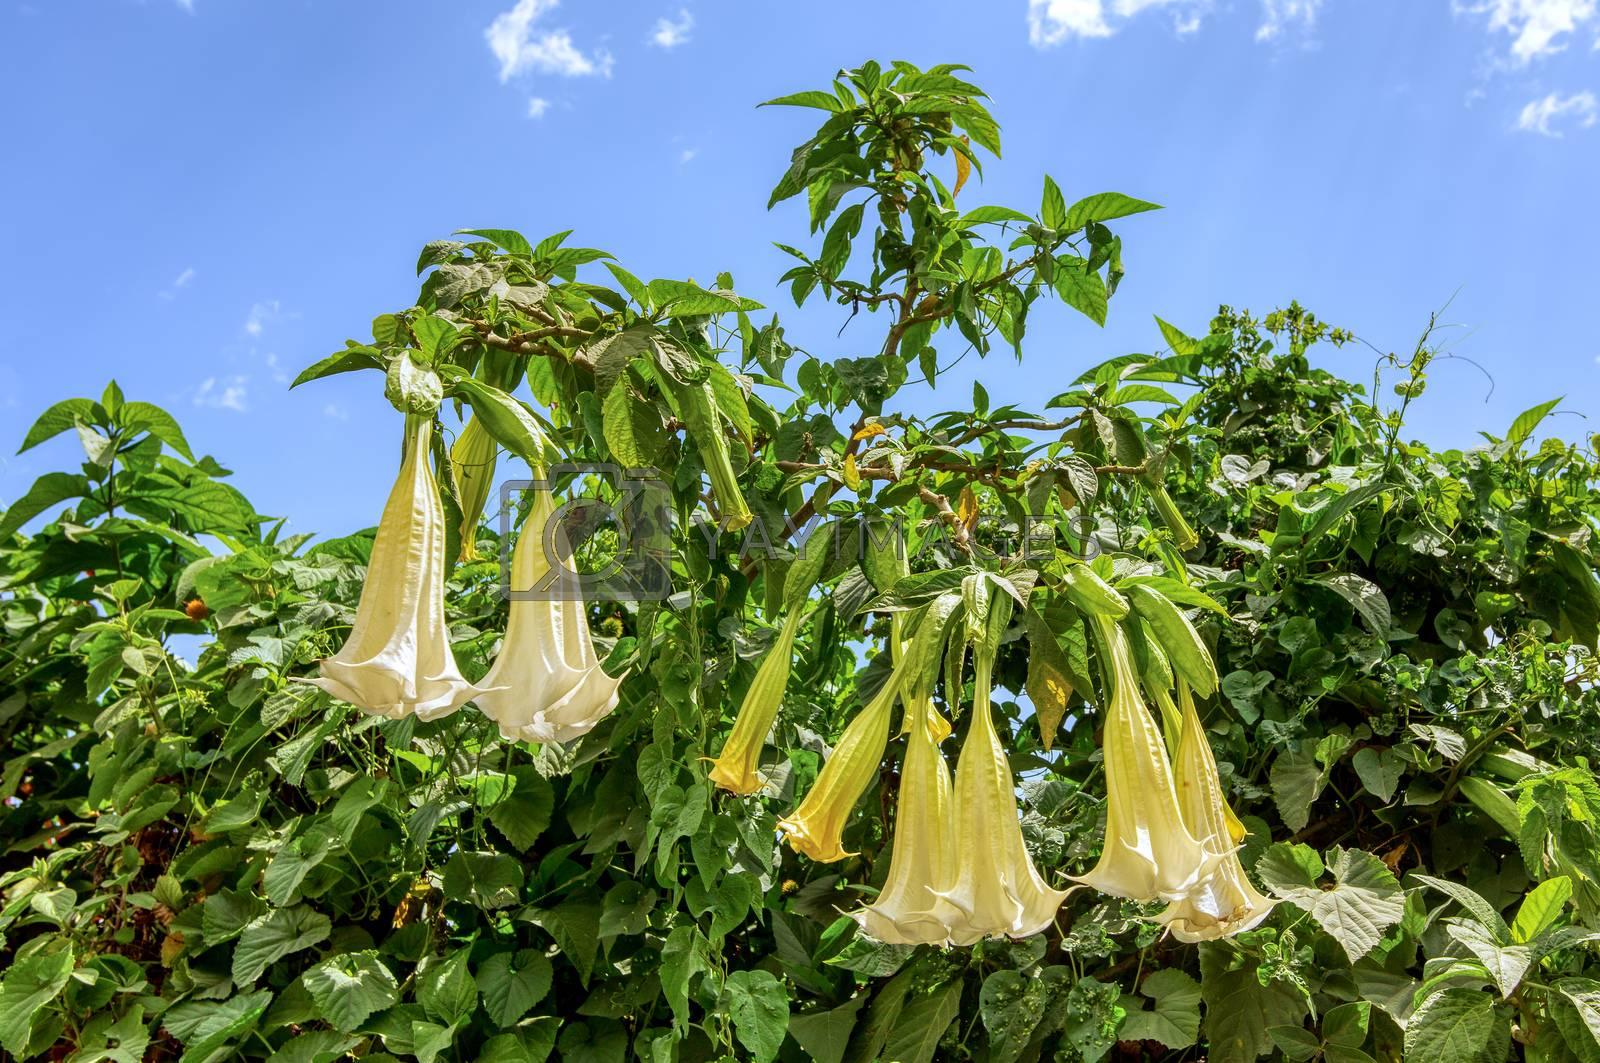 White Angels Trumpet flowers, Datura Stramonium, wild flower in Ethiopian countryside against blue sky, Ethiopia wilderness